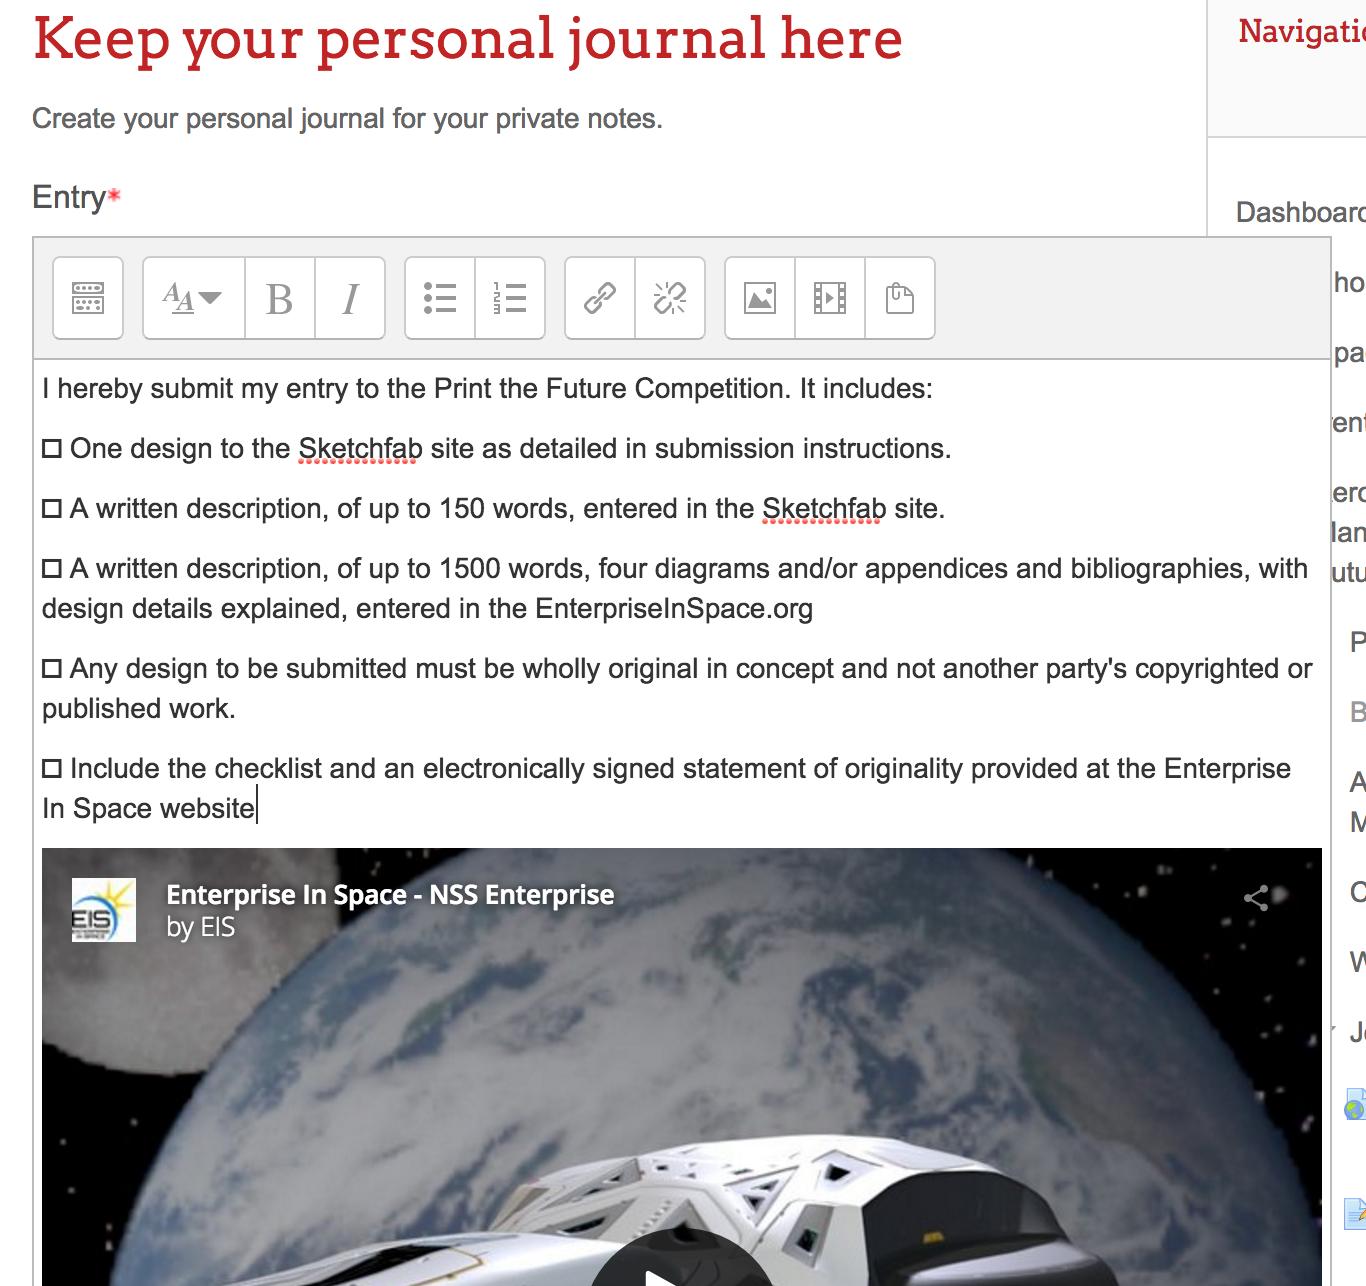 A screenshot of a journal entry on EIS Academy